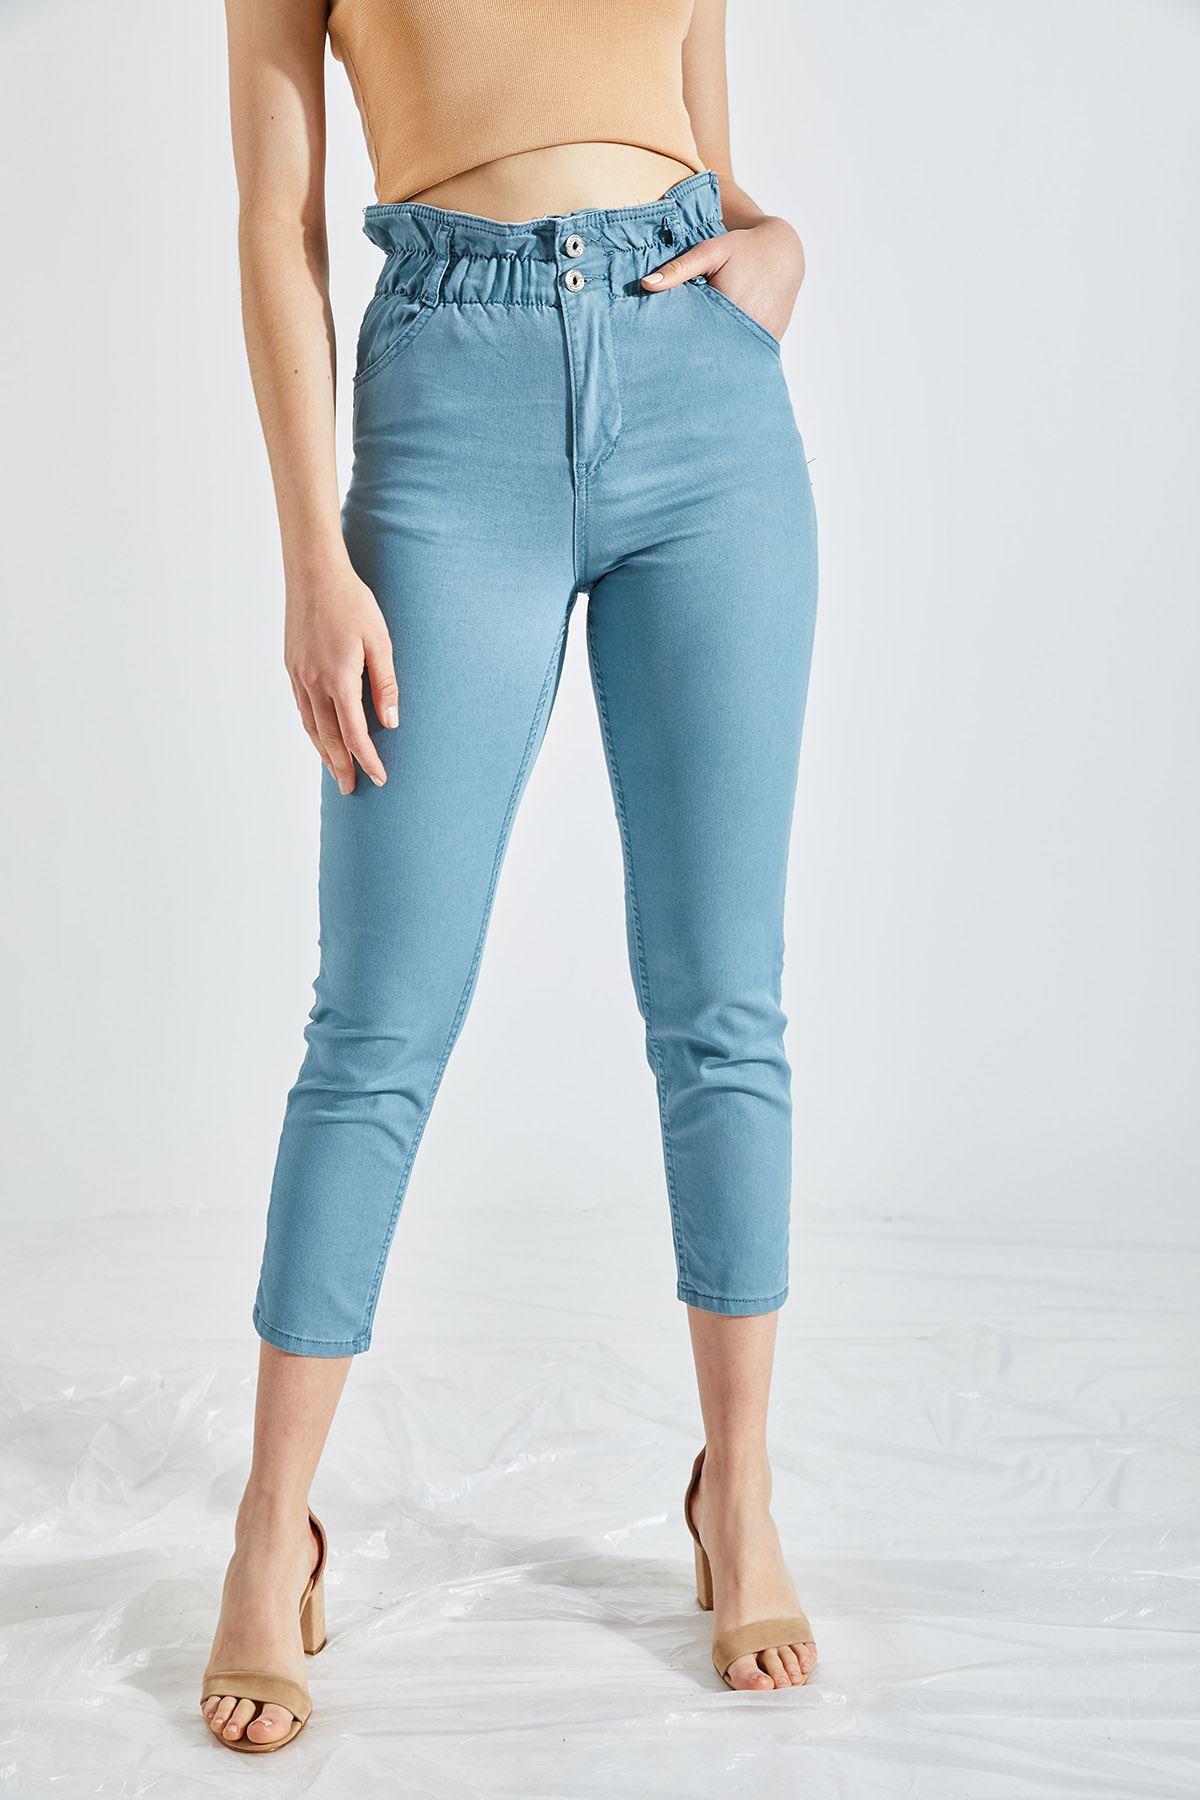 Kadın Likralı Bel Lastikli Mavi Kot Pantolon